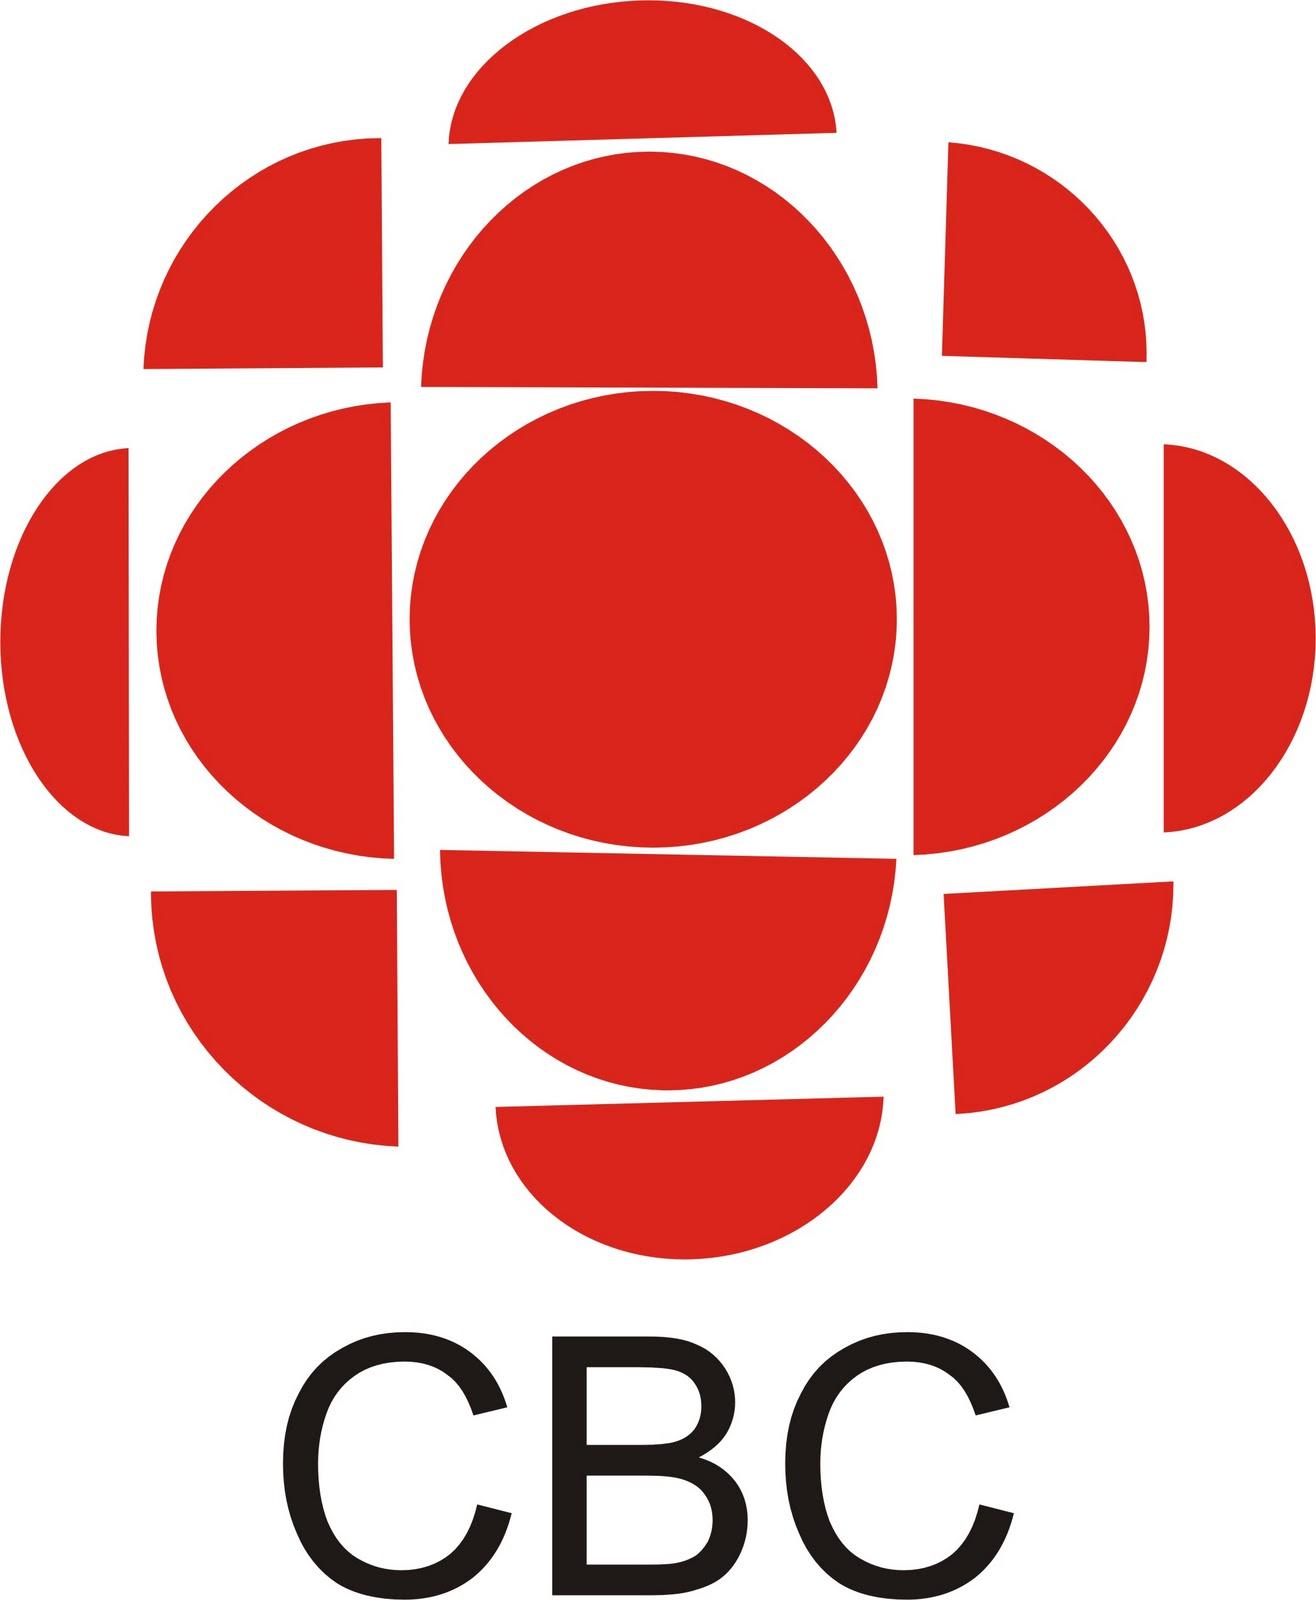 logo-cbc-png-filename-cbc-jpg-1316.jpg